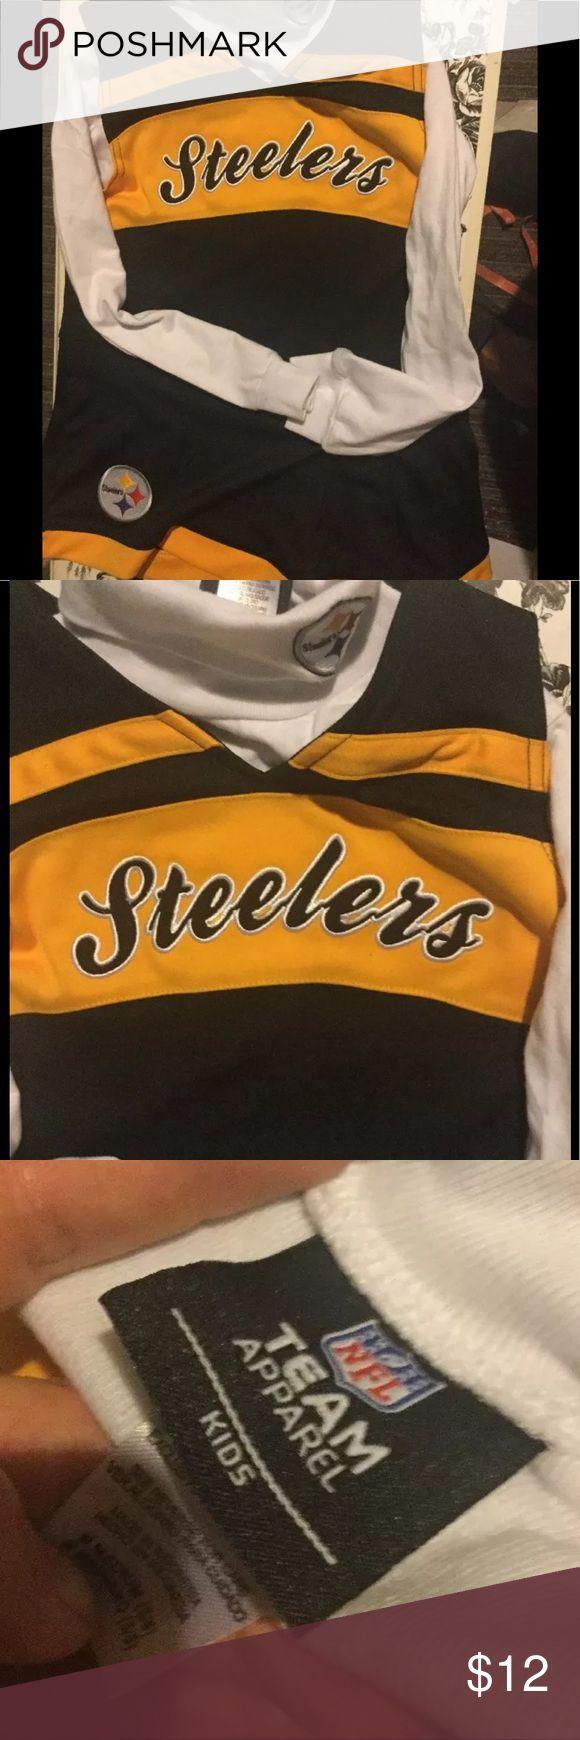 Pittsburgh Steelers Cheerleader Uniform Dress Girls Size 5 6 Pittsburgh Steelers Cheerleader Uniform Dress Cute! nfl Dresses Casual